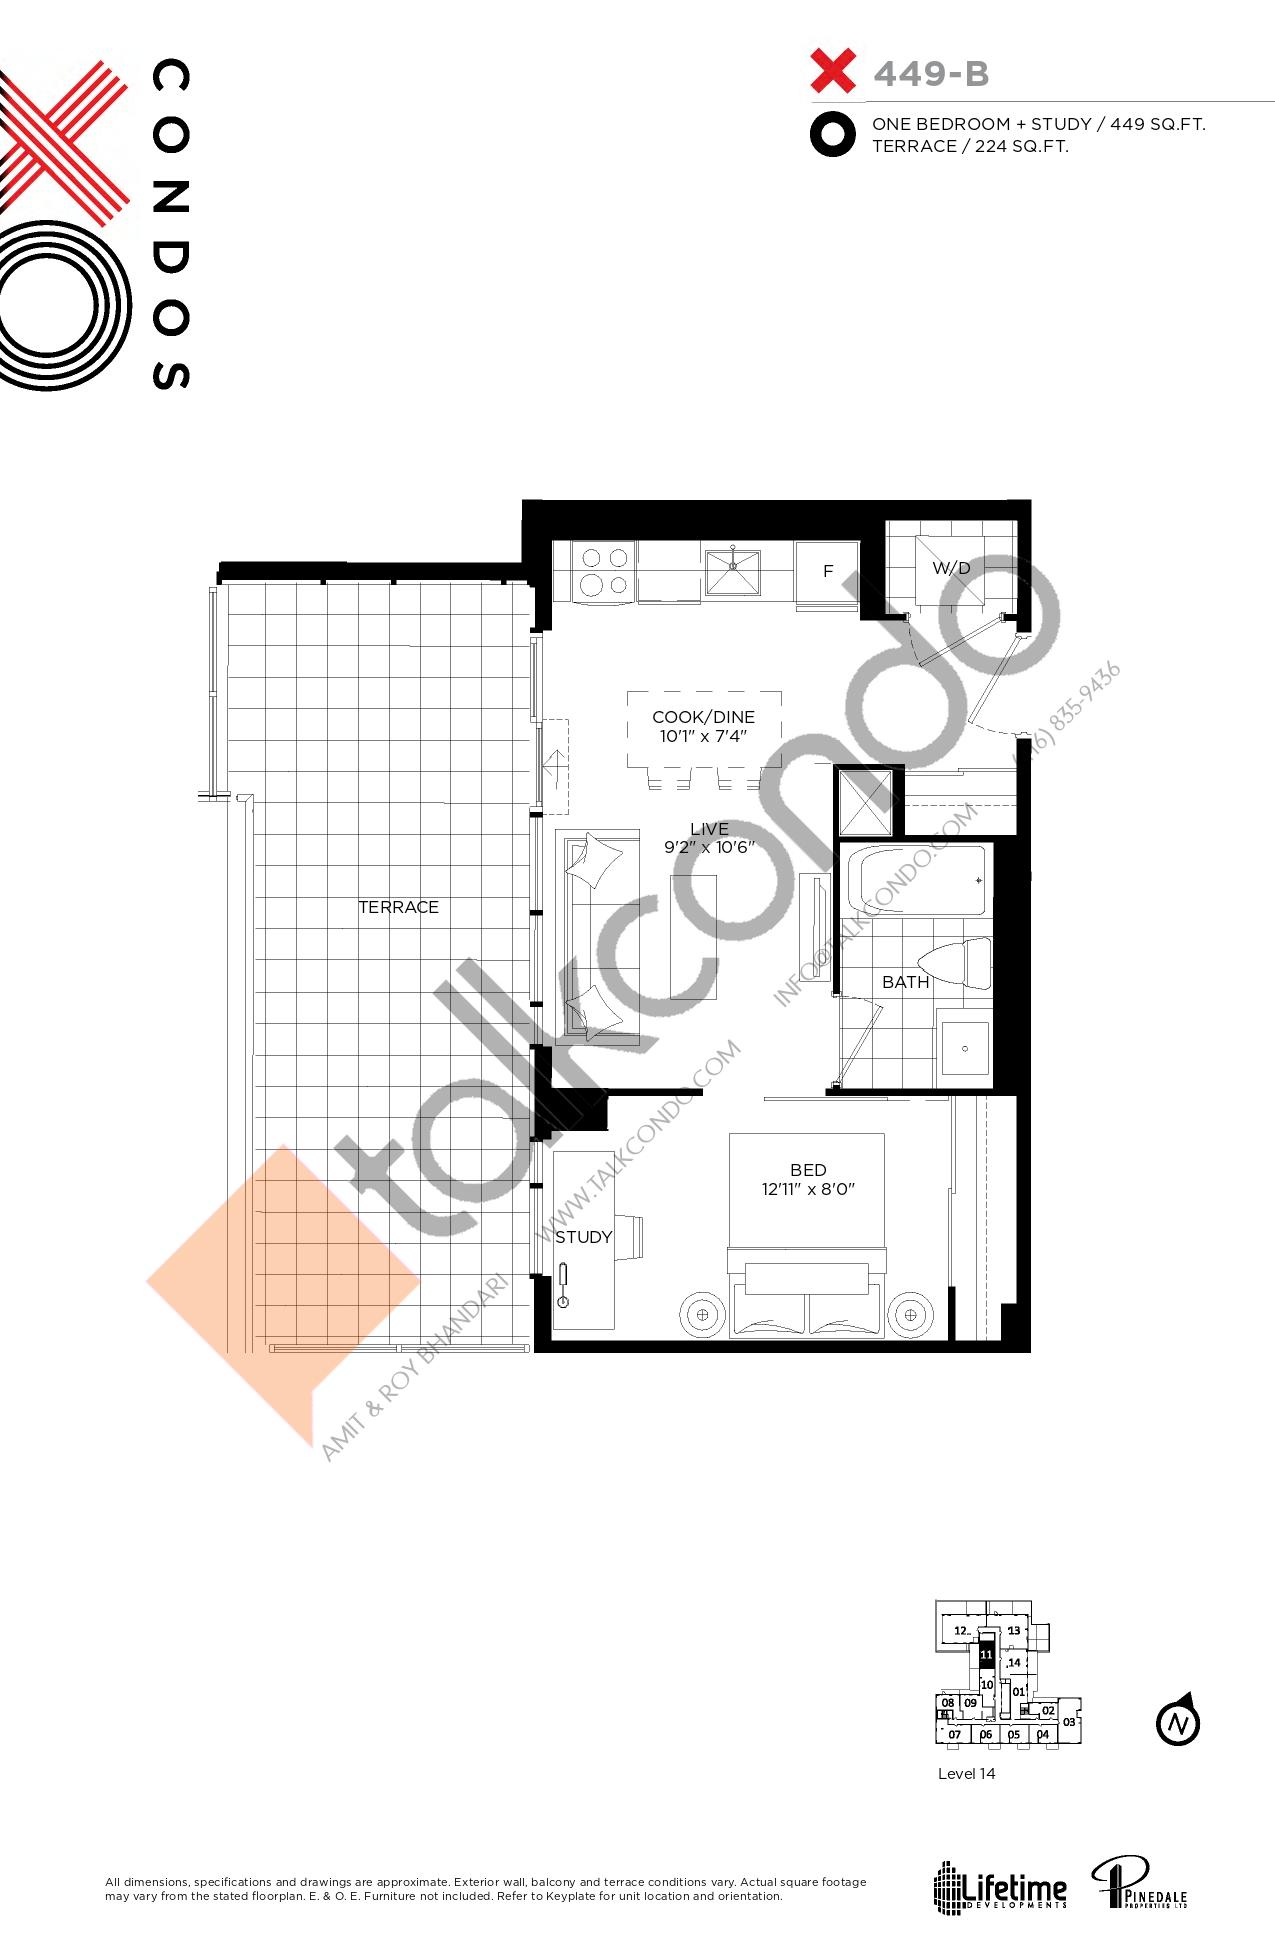 X449-B Floor Plan at XO Condos - 449 sq.ft